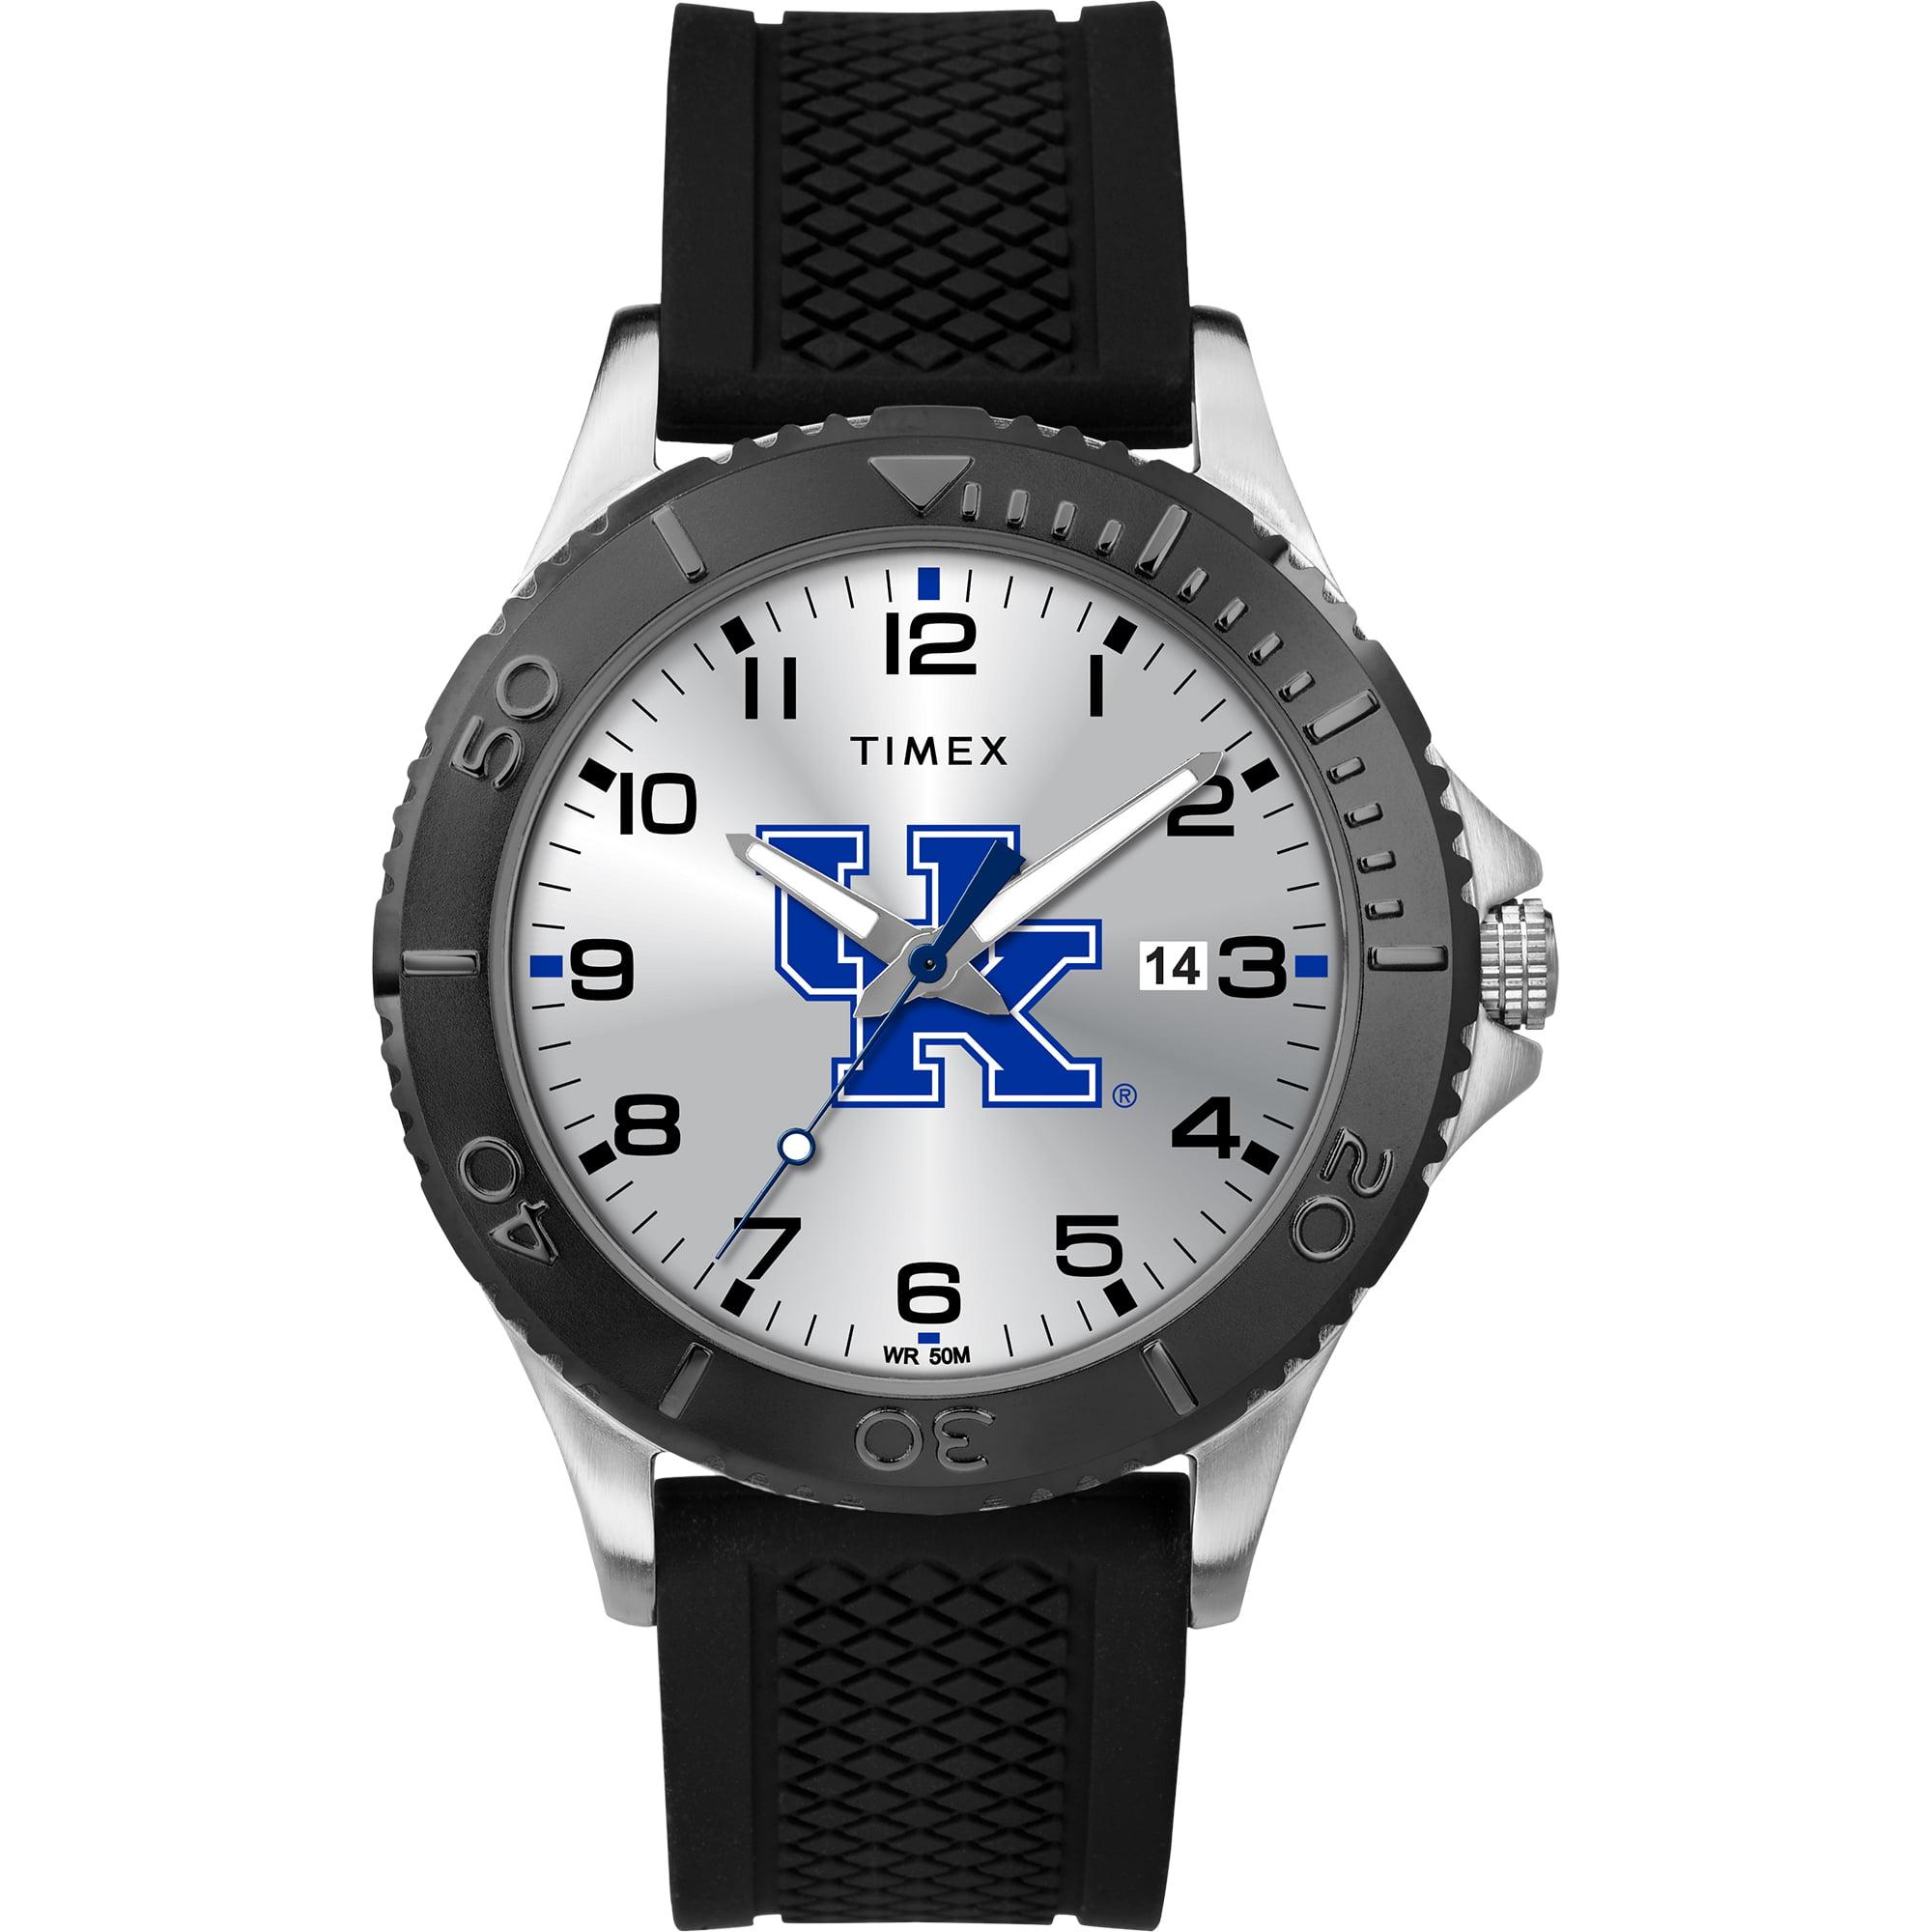 Timex - NCAA Tribute Collection Gamer Black Men's Watch, University of Kentucky Wildcats